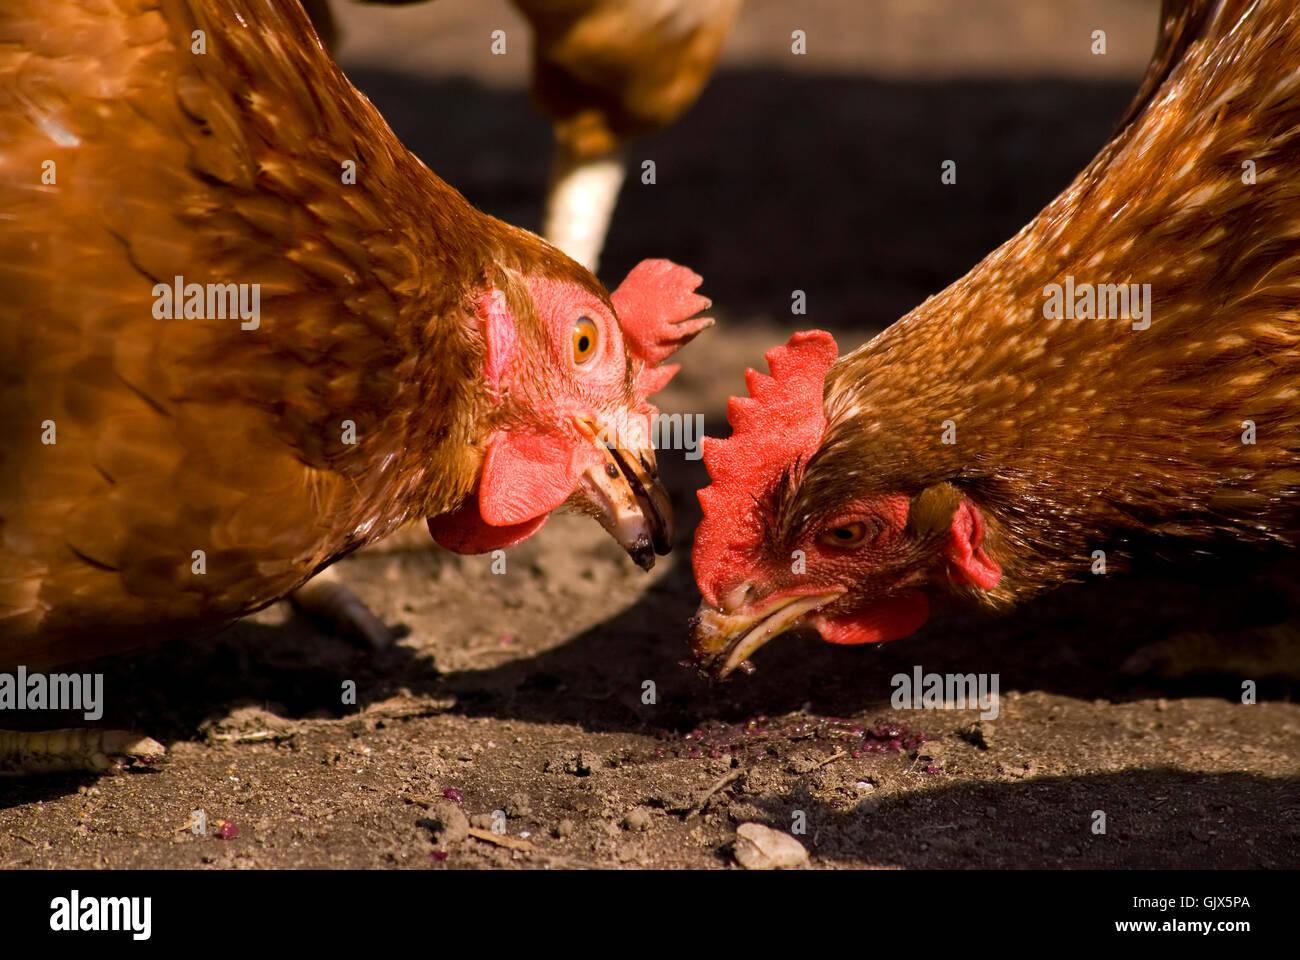 Oiseaux animaux oiseaux Photo Stock